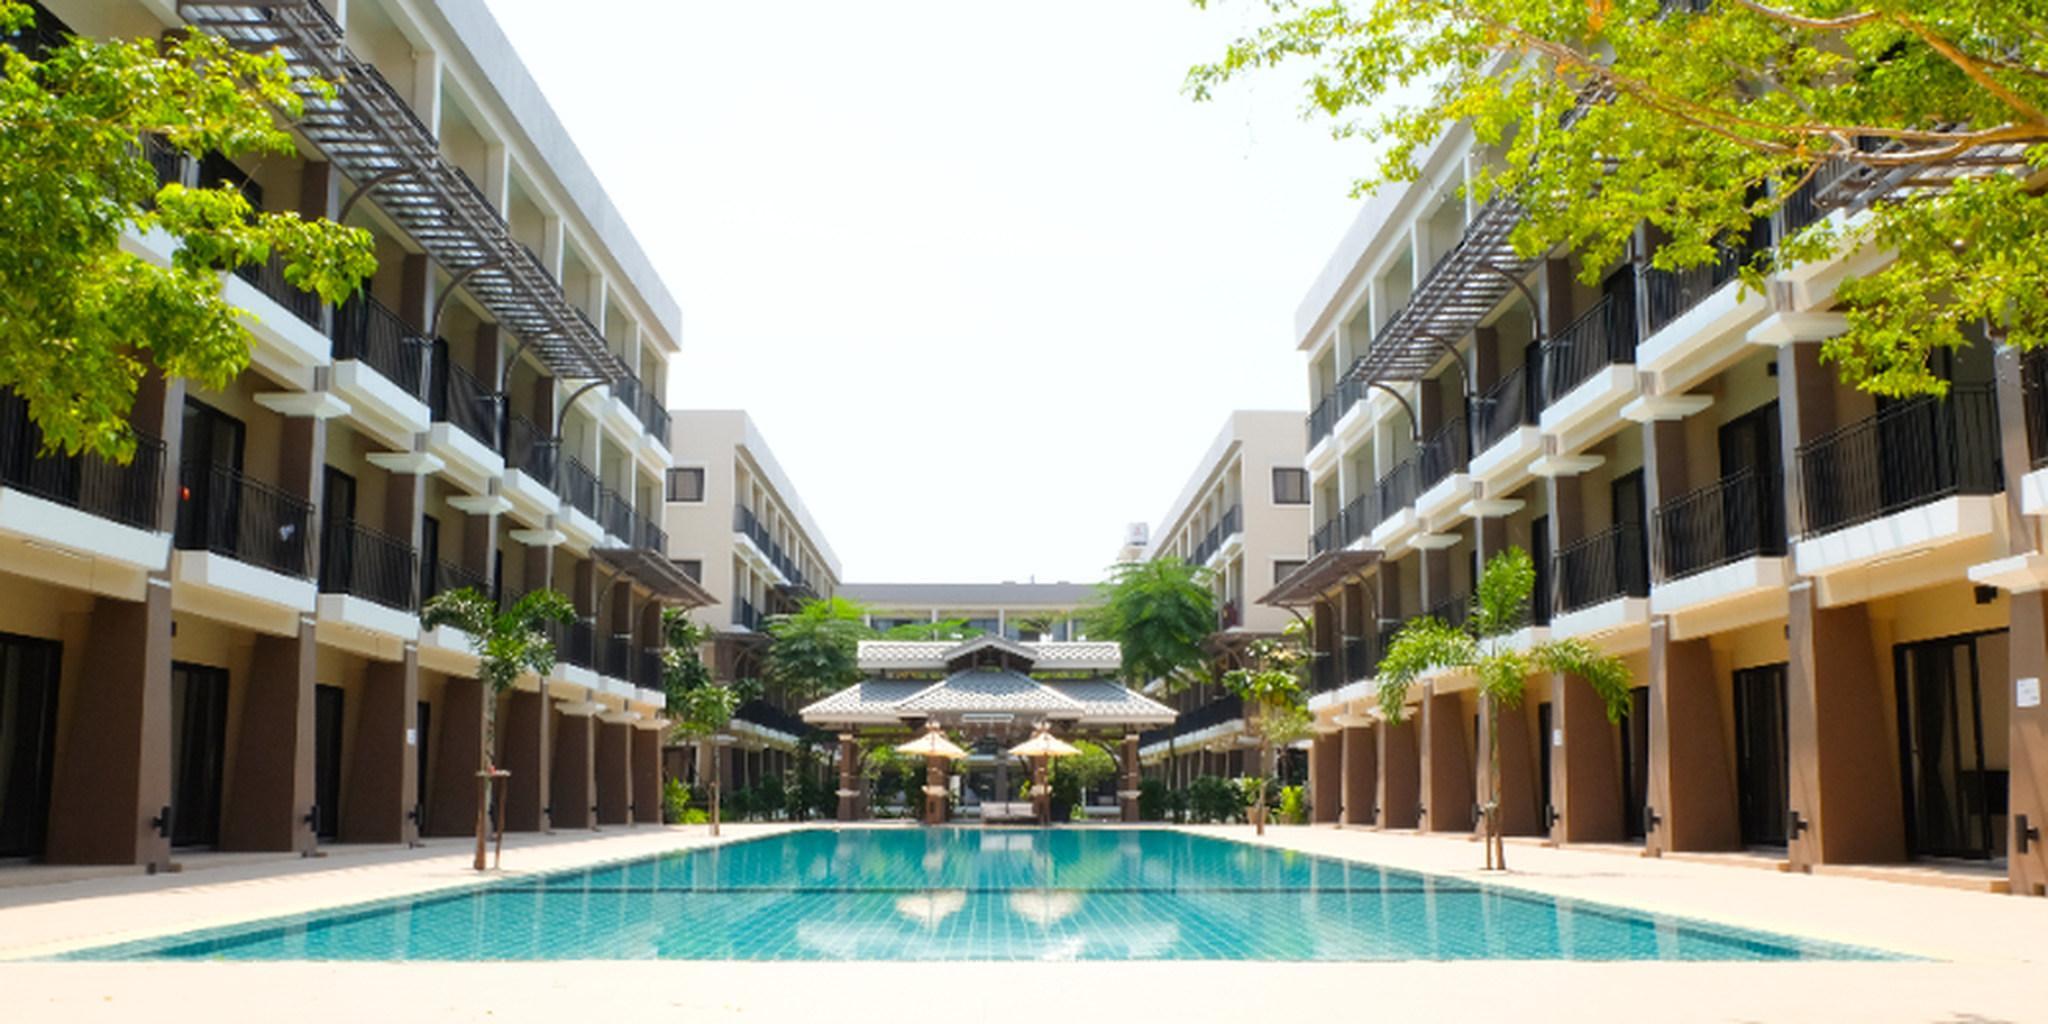 Summer Tree Hotel Bangkok Thailand Hotels Hotel reservations